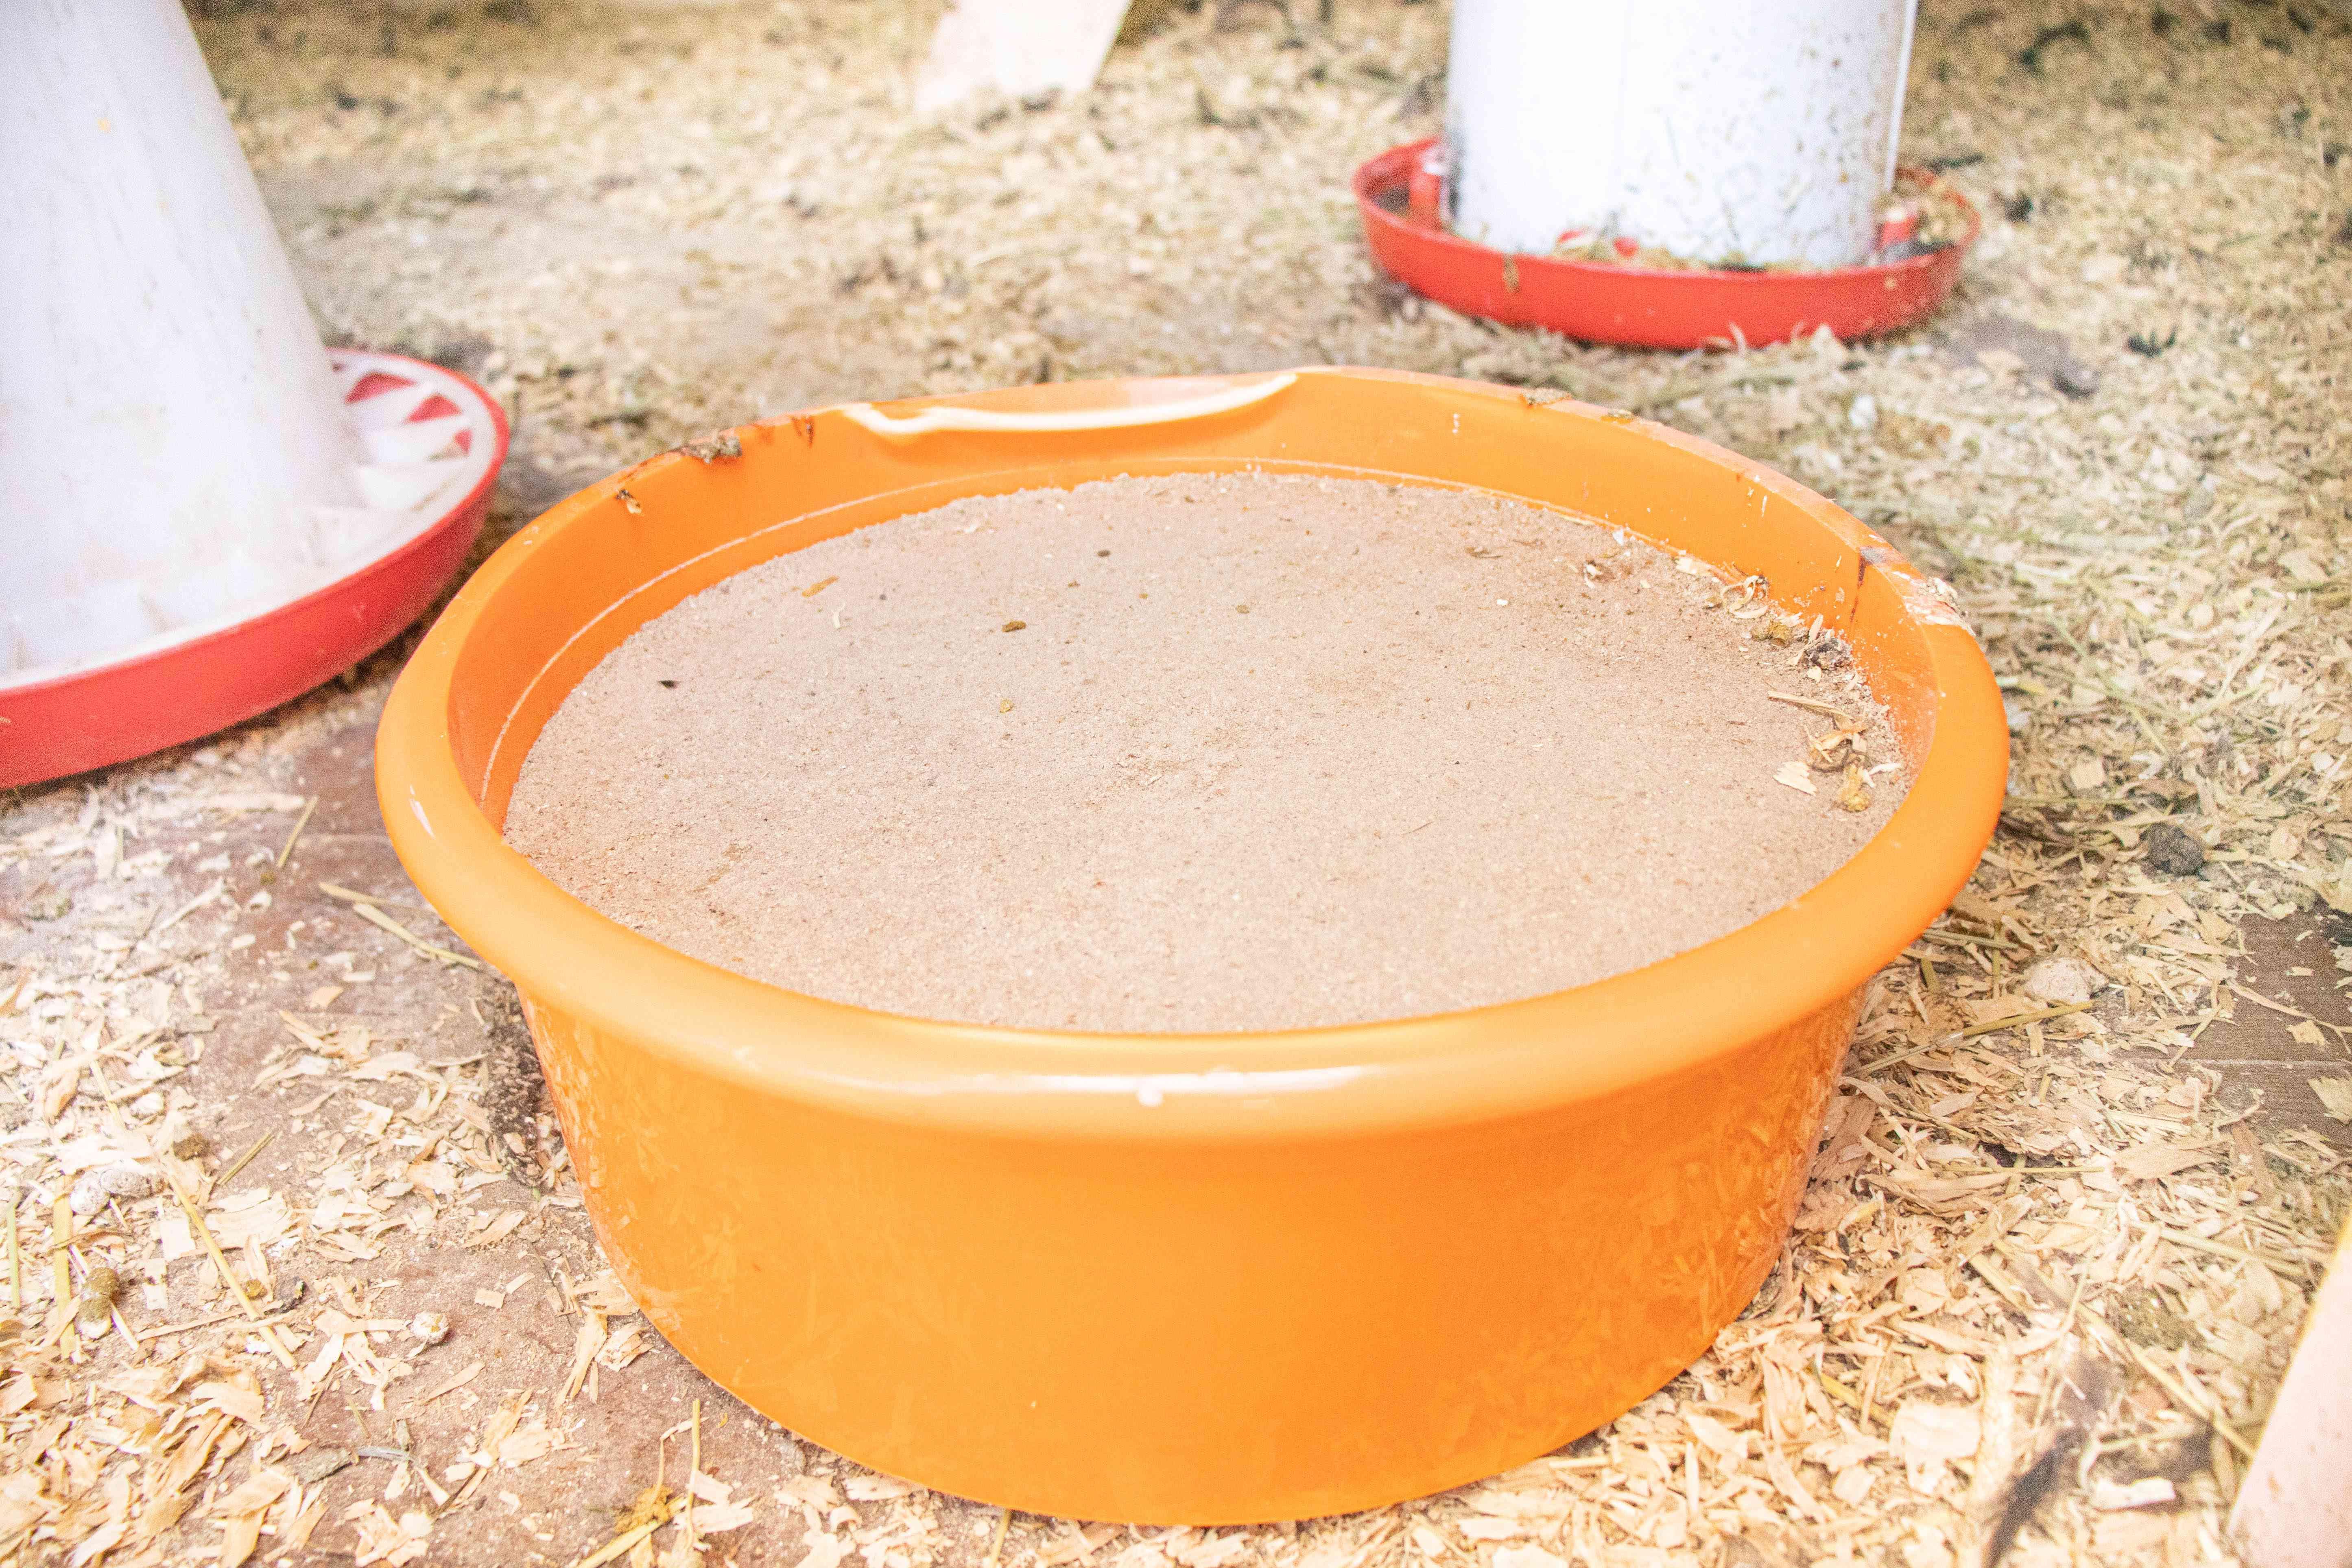 Grit feed in orange plastic container